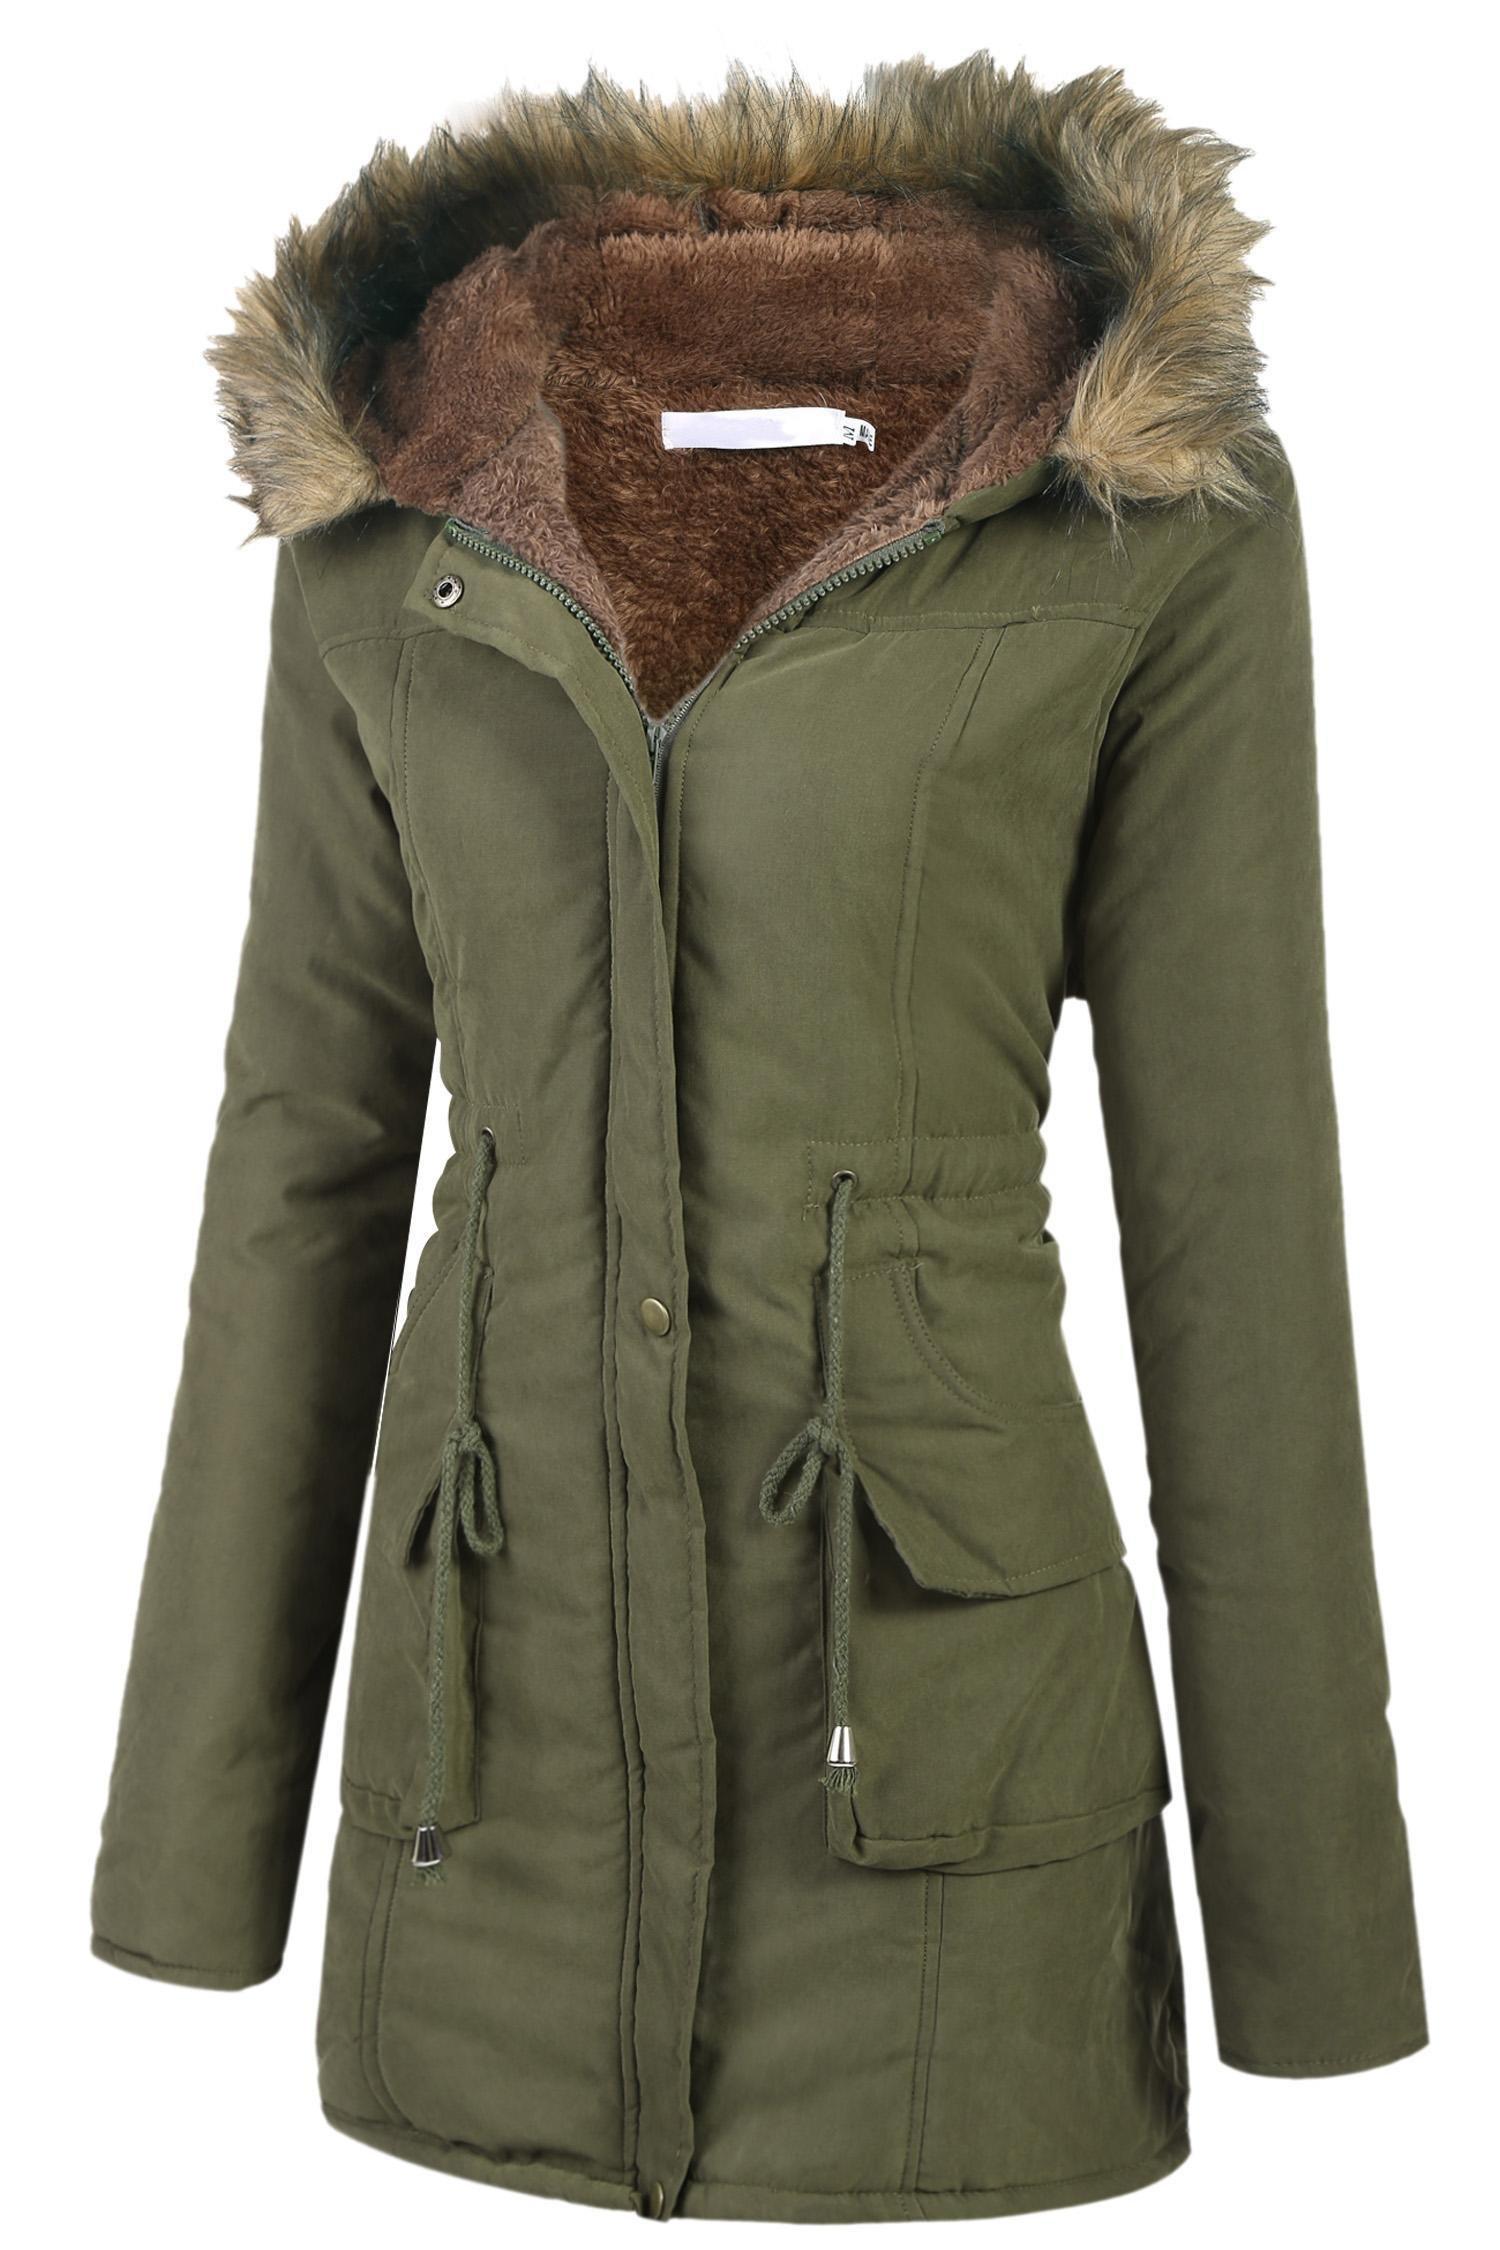 Asatr Women's Winter Jacket Casual Thicken Hooded Fleece Lining Zipper Padded Coat